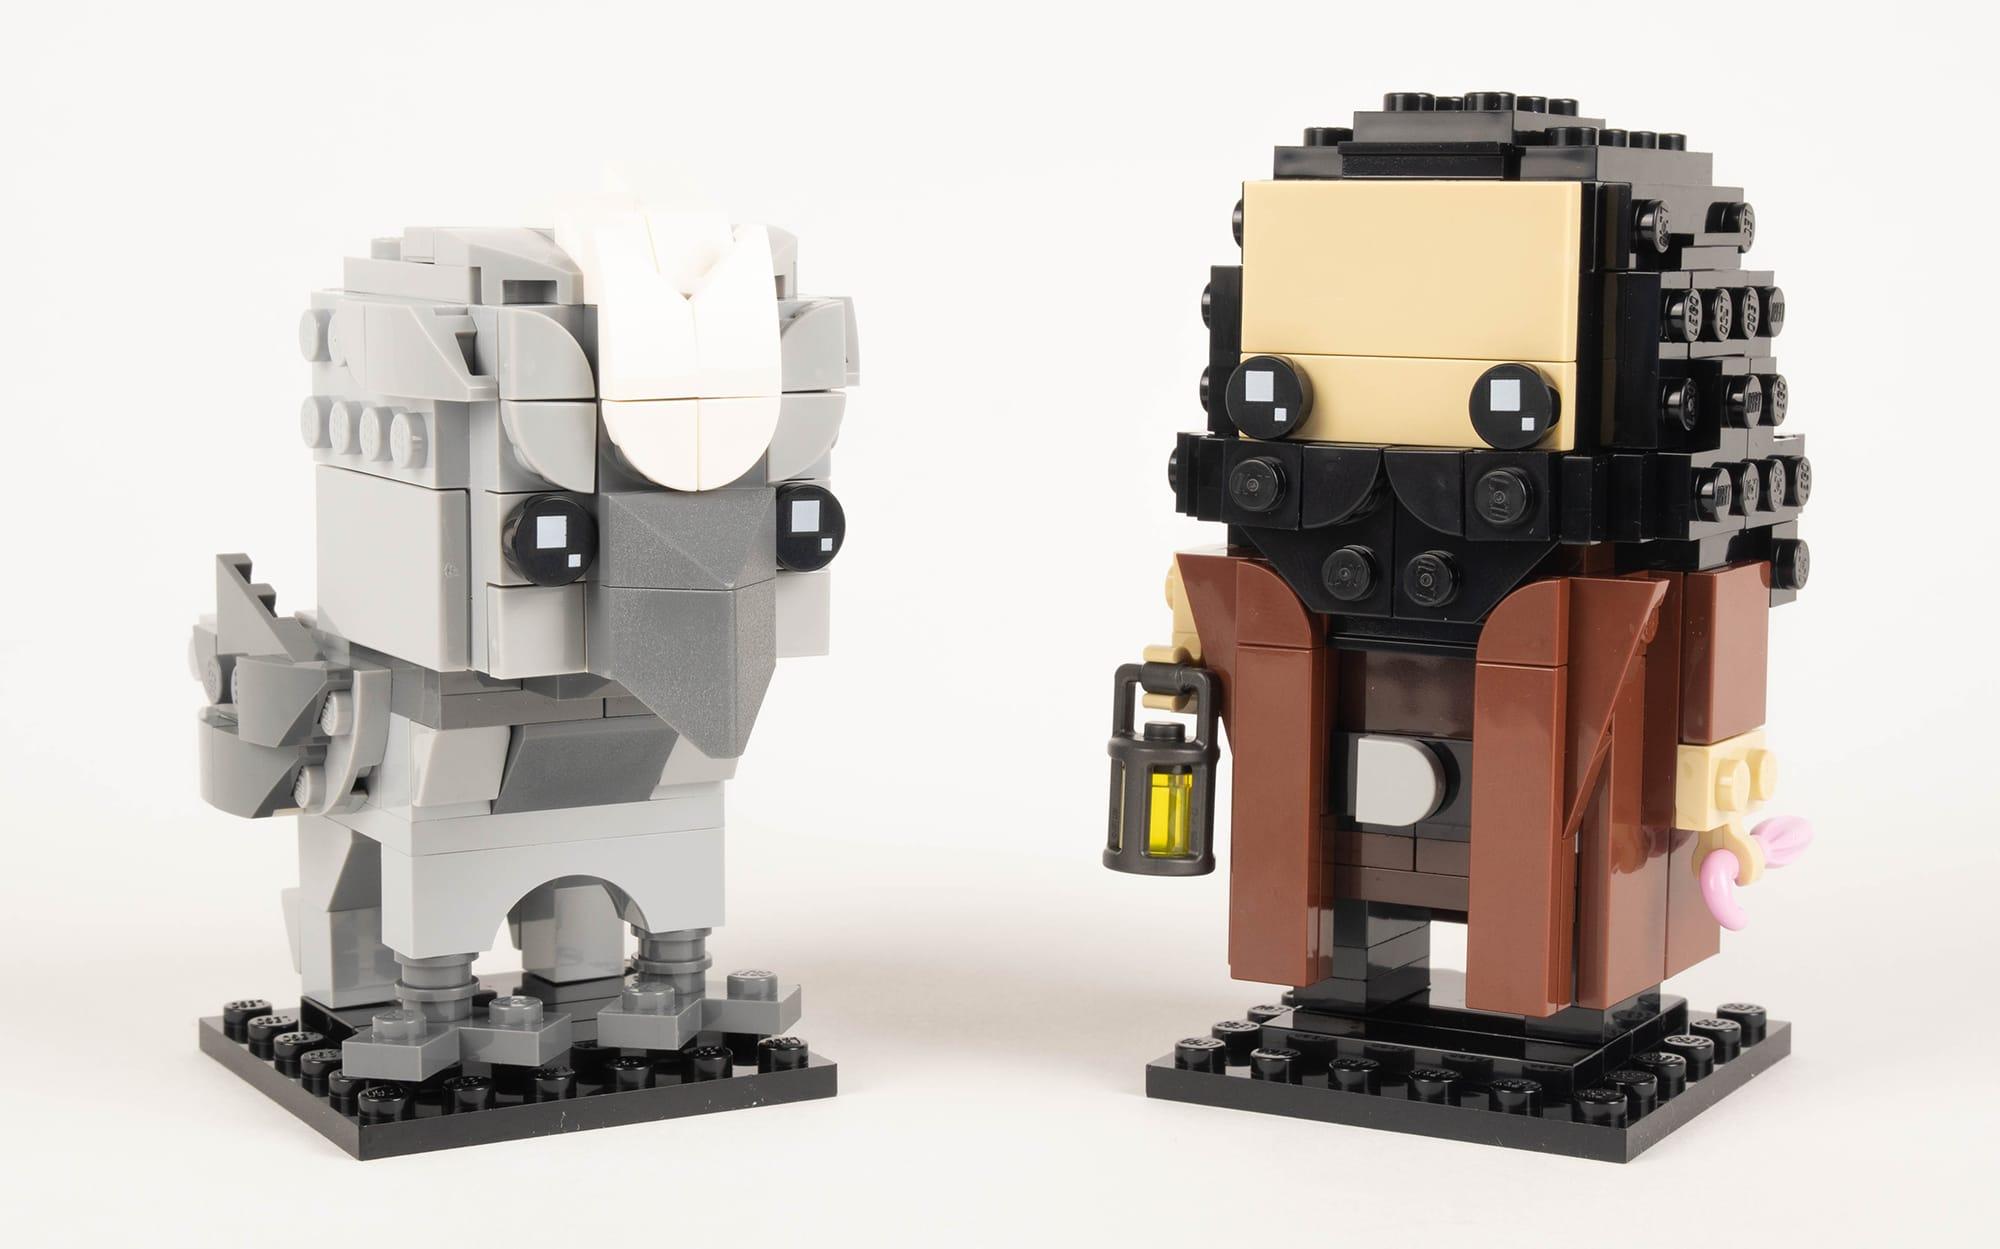 LEGO 40412 Hagrid Seidenschnabel Brickheadz Review 16